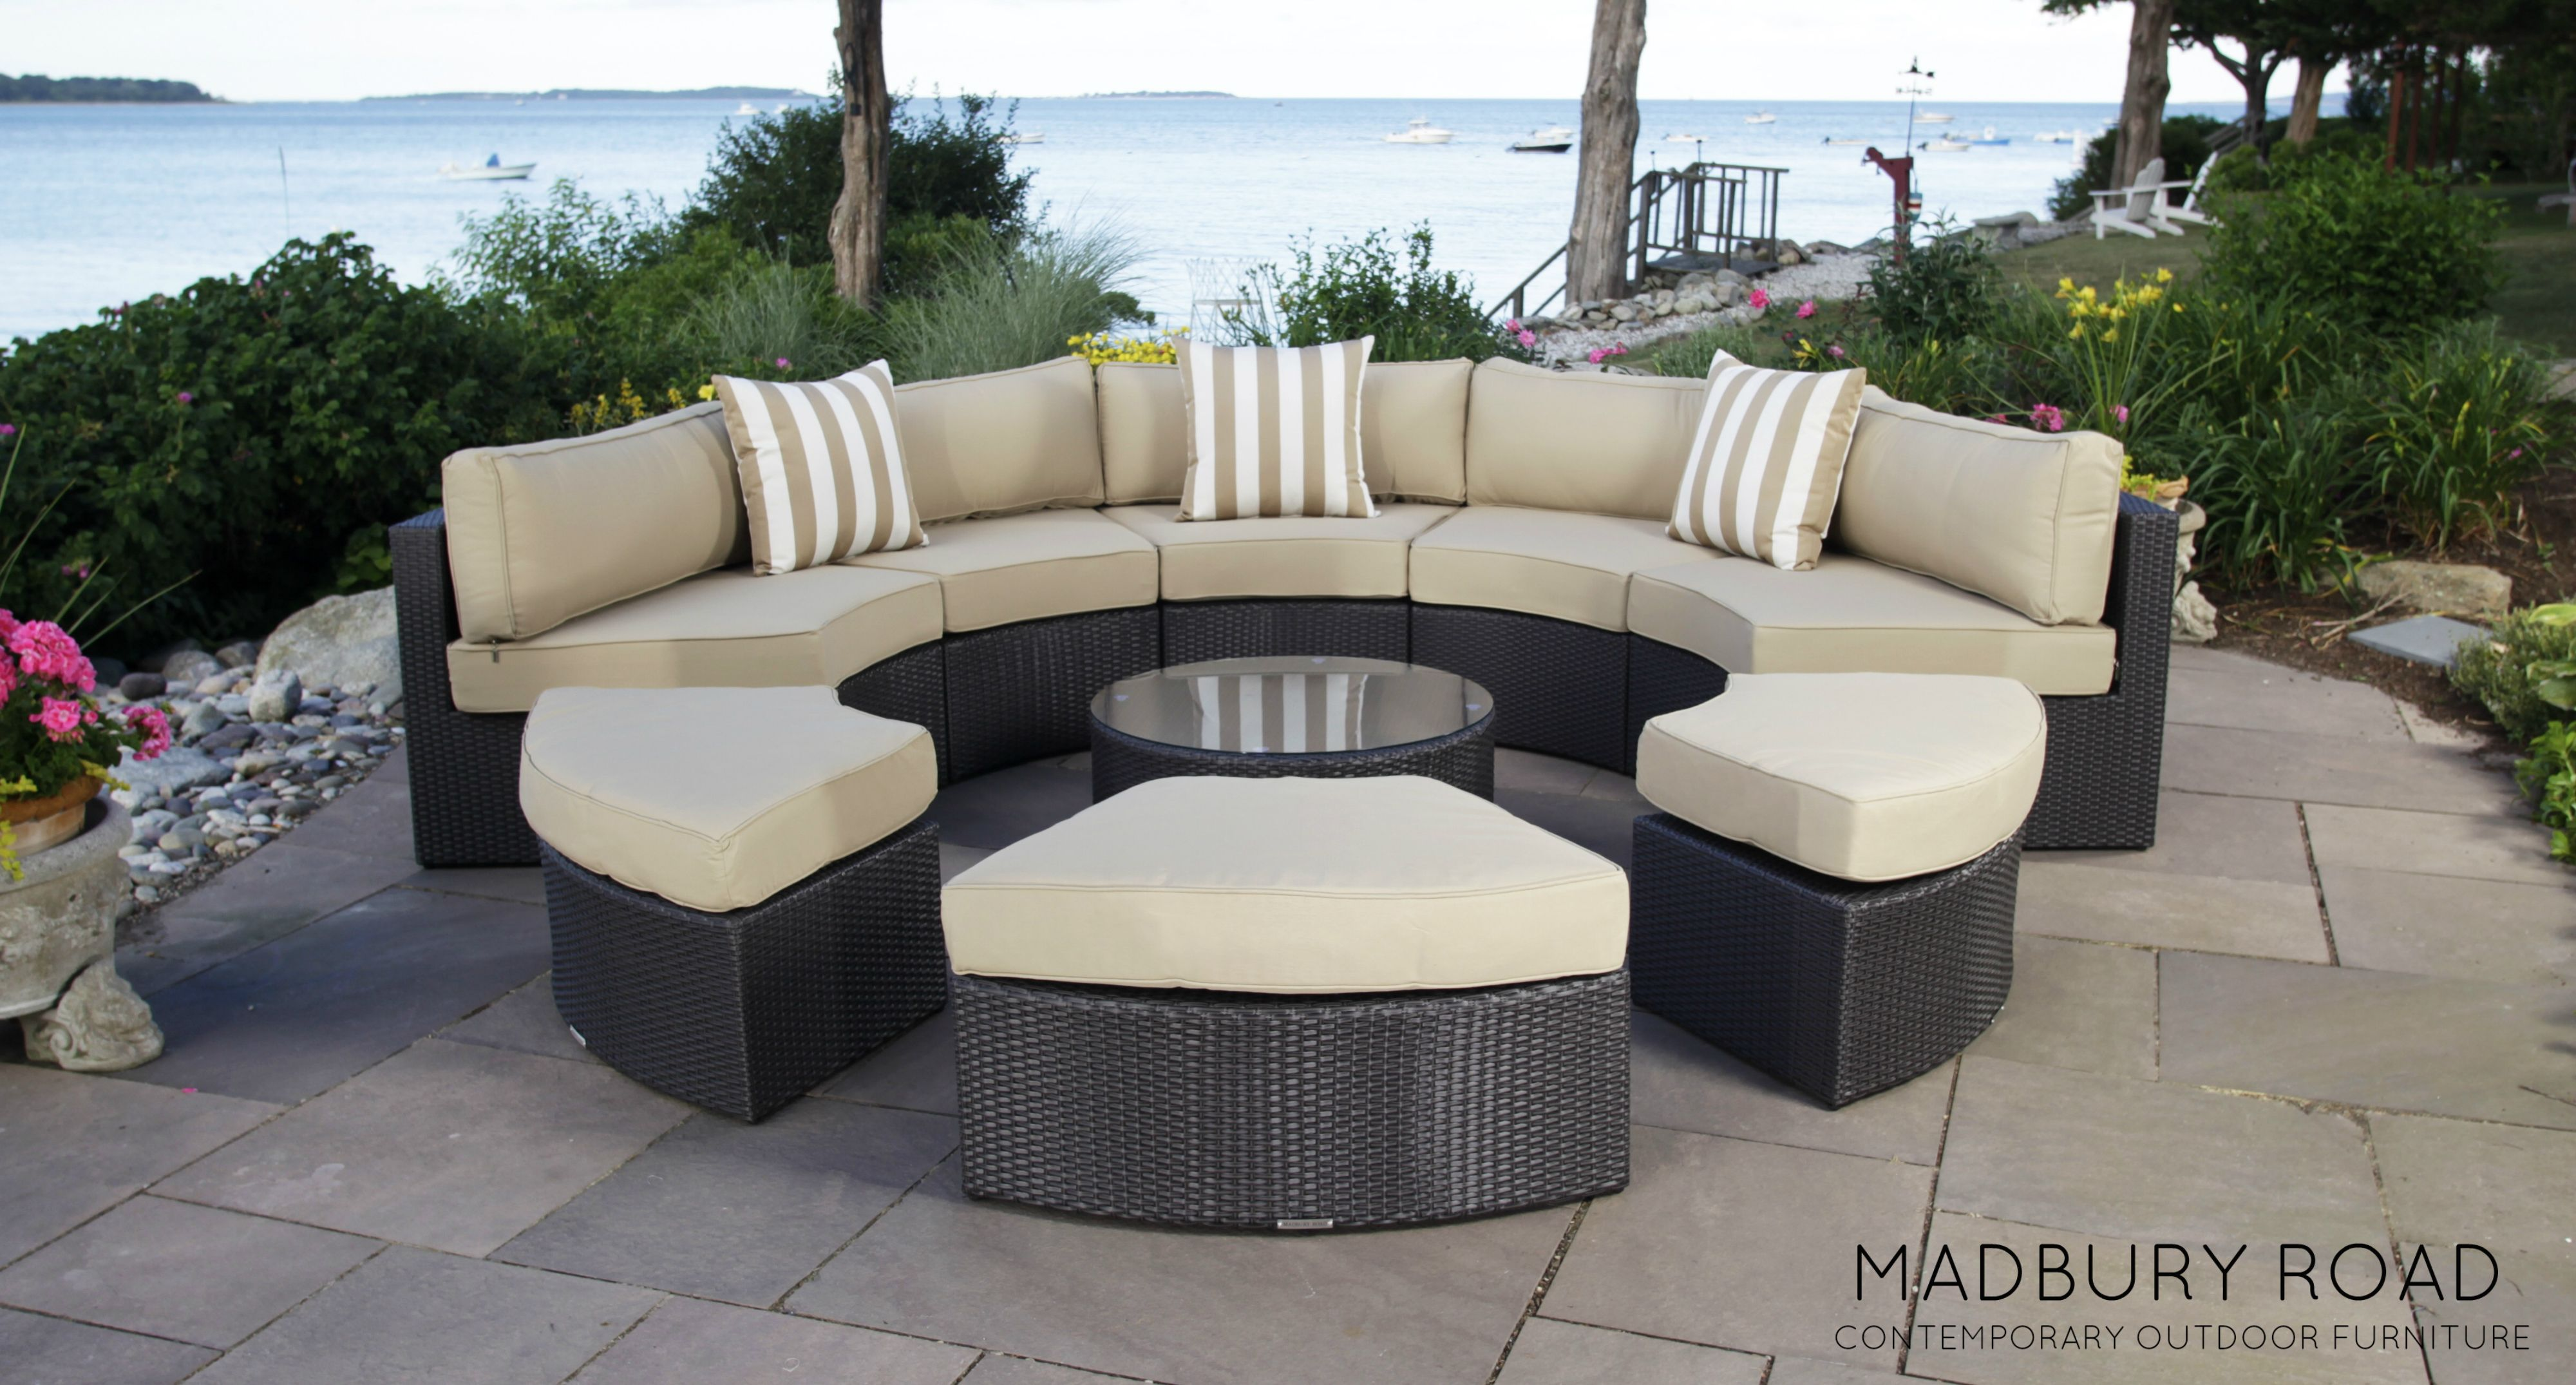 Santorini Outdoor Daybed Madbury Road Furniture Outdoor Sofa